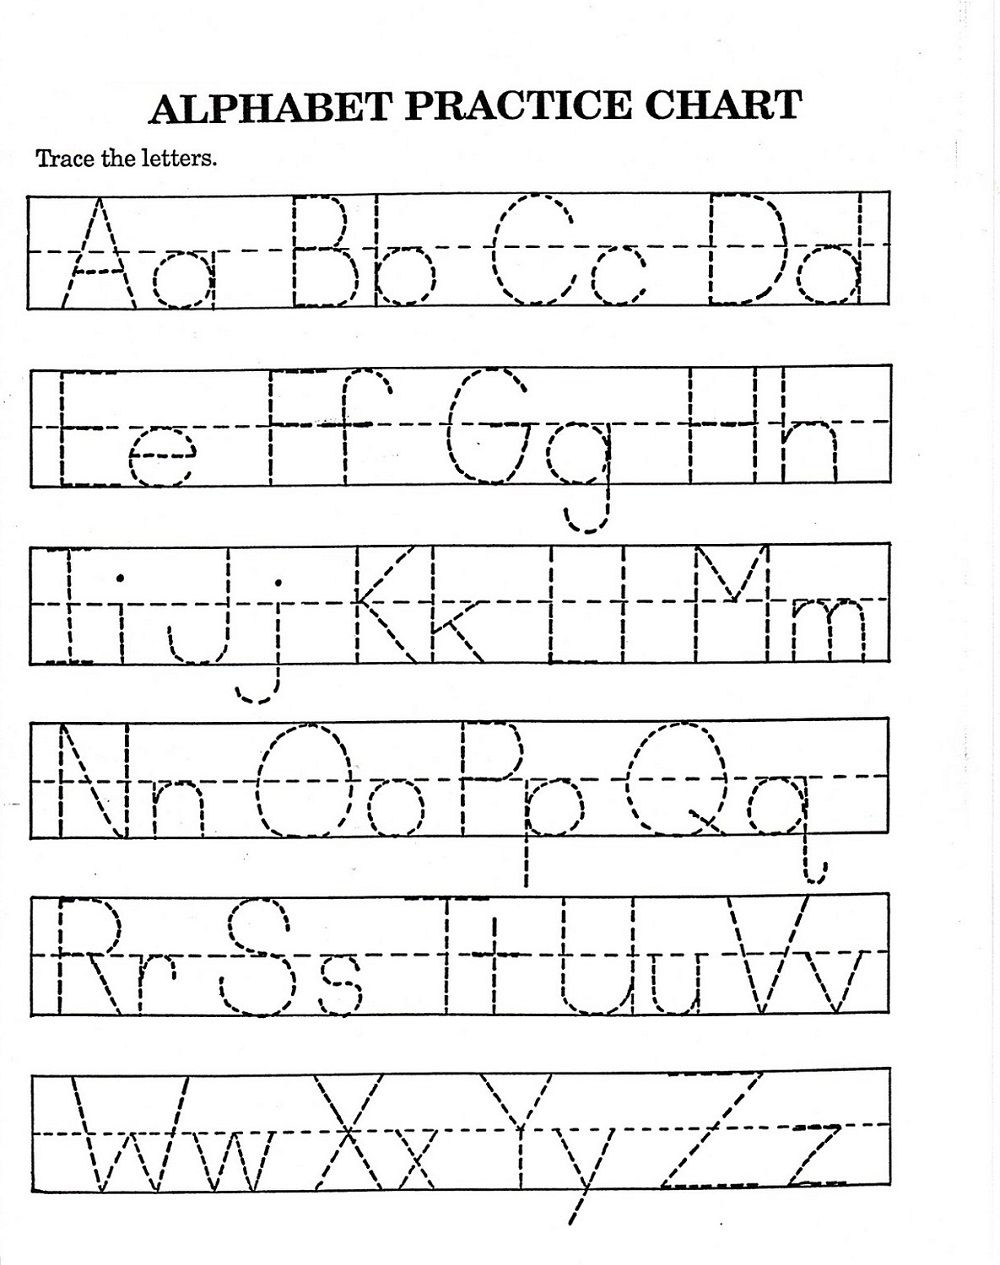 Traceable Alphabet Worksheets A-Z | Alphabet Worksheets Free with Alphabet Worksheets A Z With Pictures